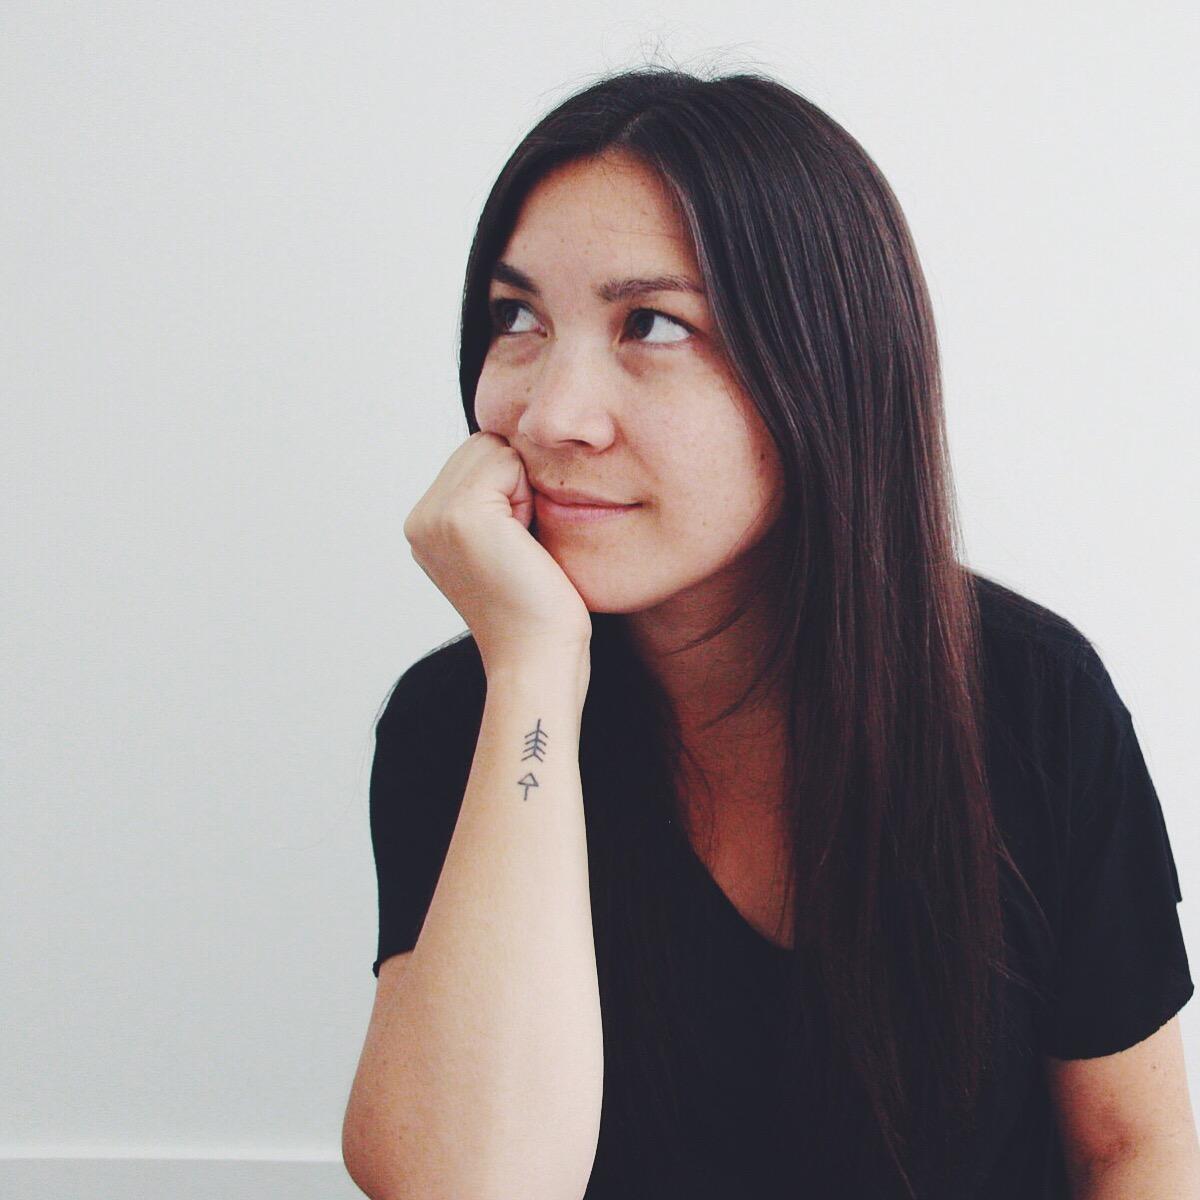 Musings of a Mindful Mind Podcast | MindfullyAshley.com